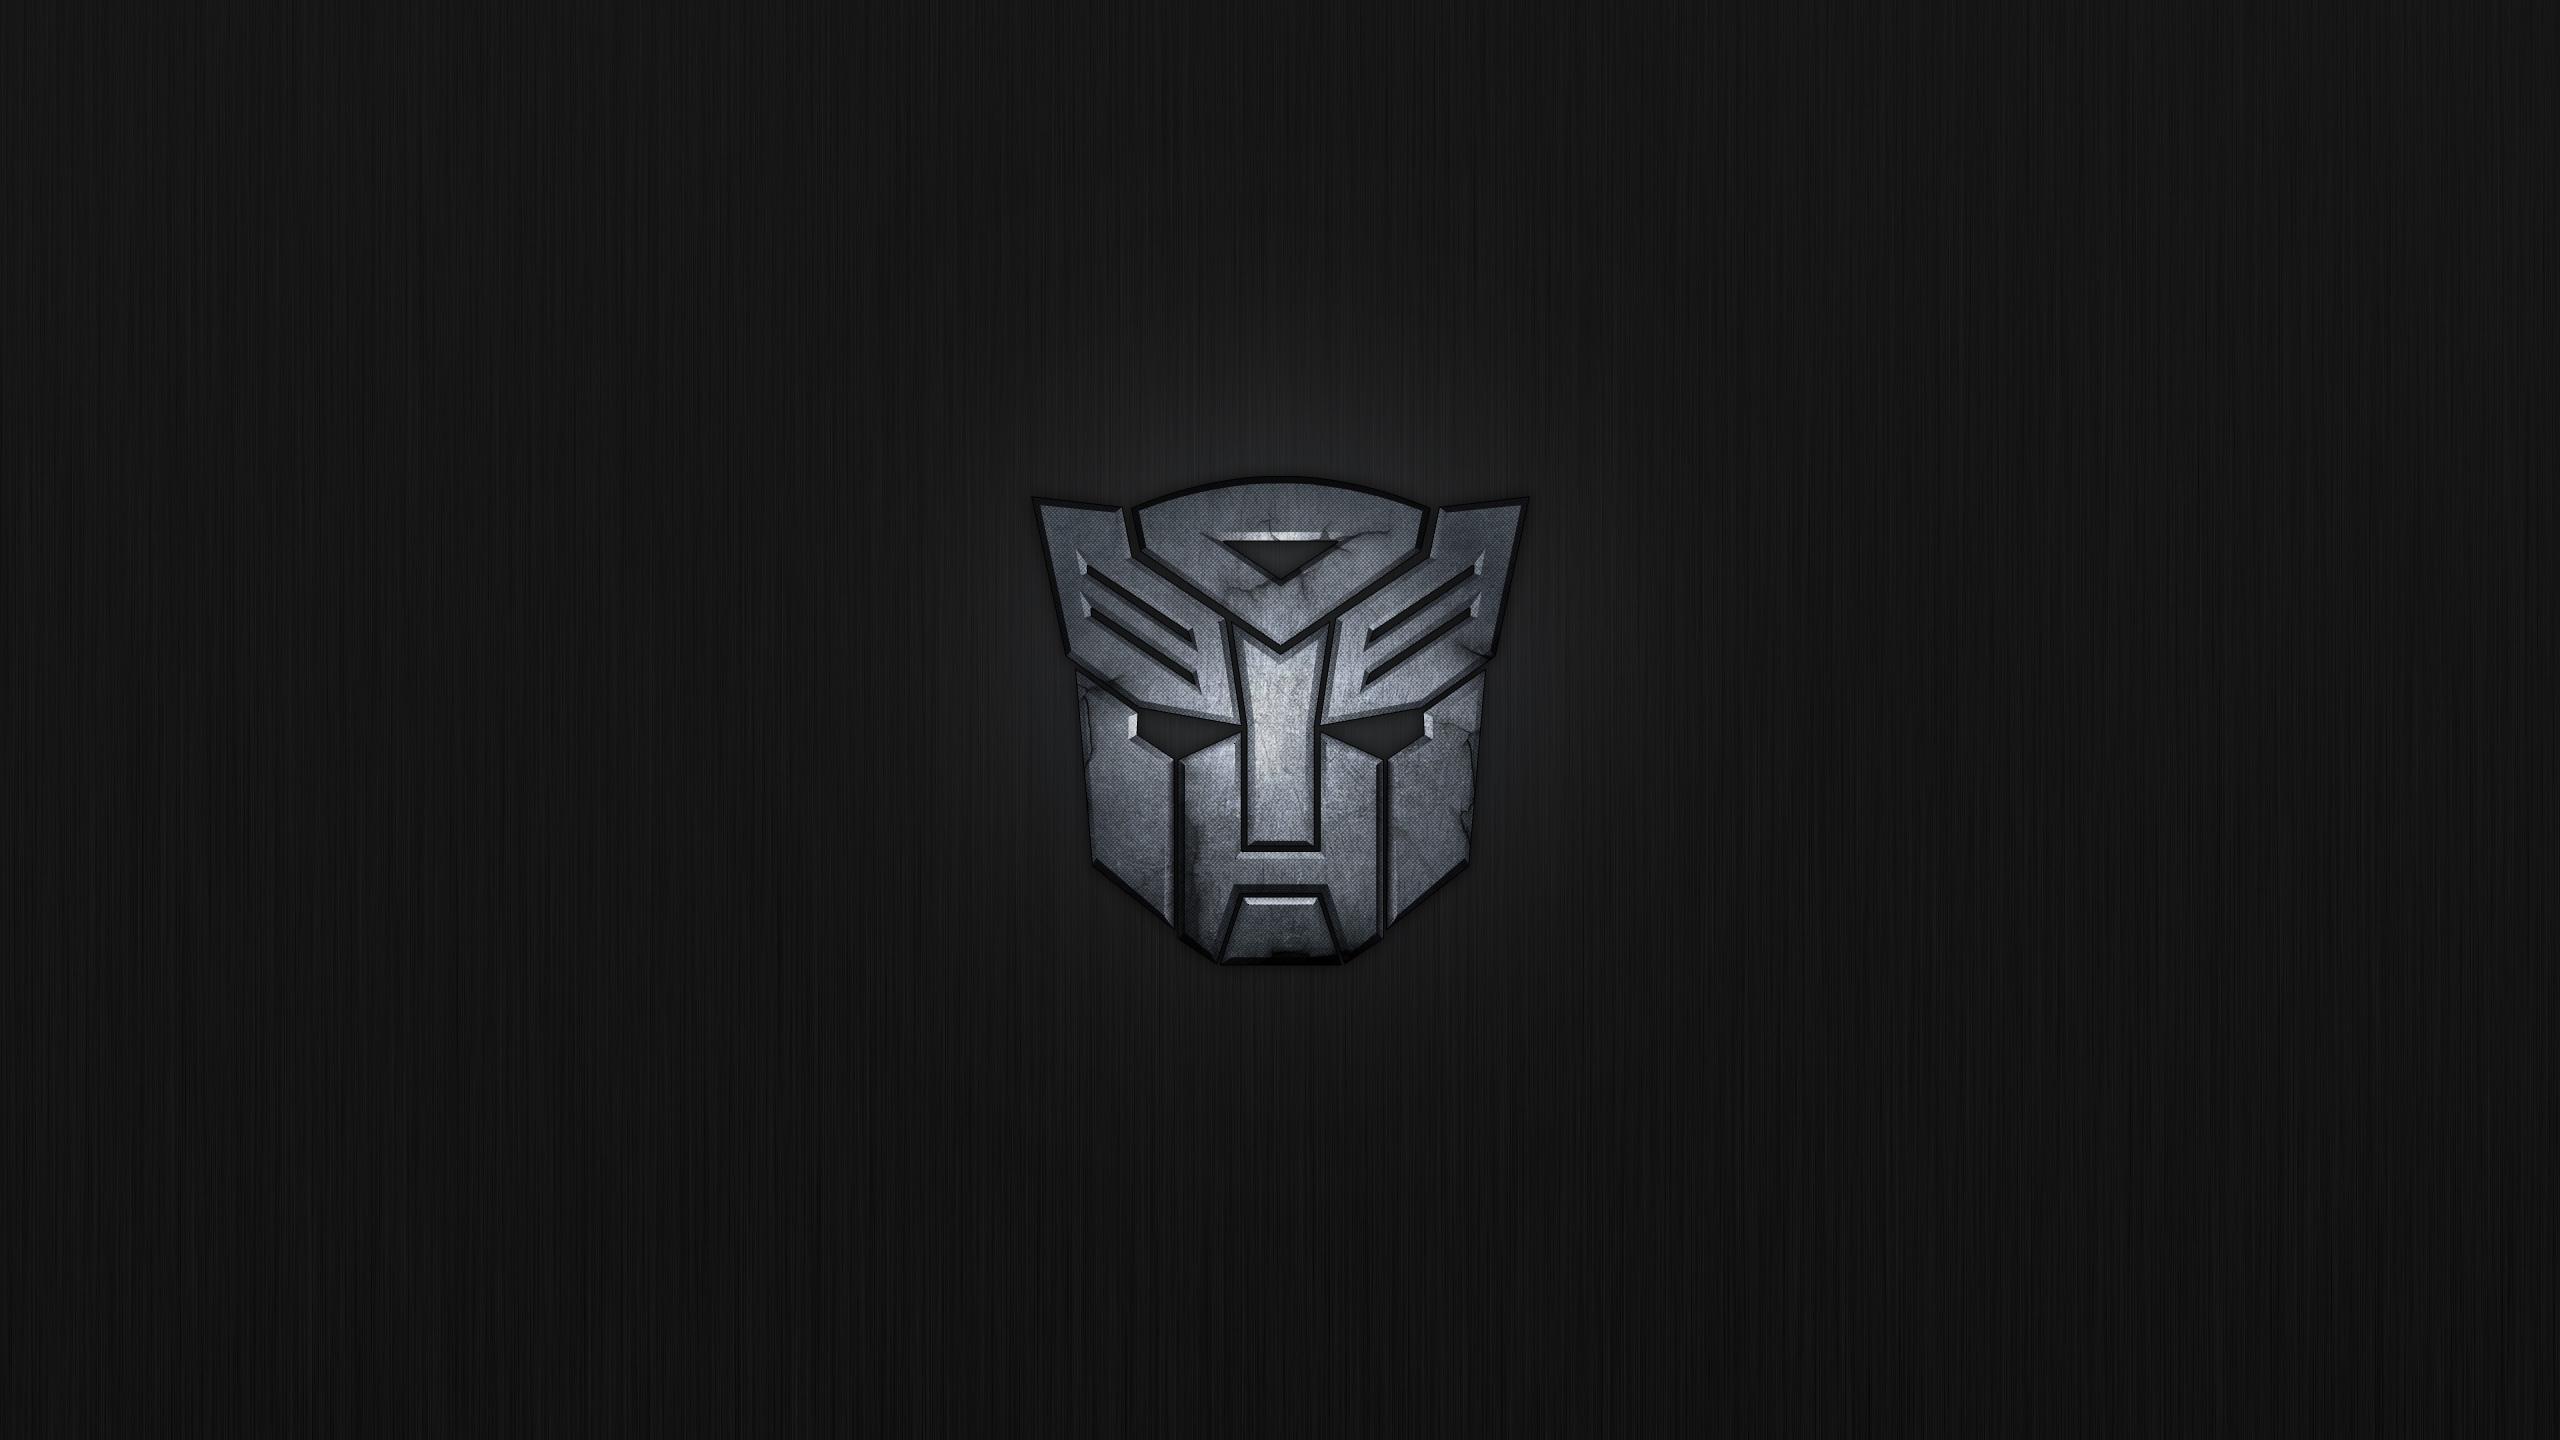 Autobot Logo Wallpaper Stock Photos 1c275zv5 Yoanu 2560x1440